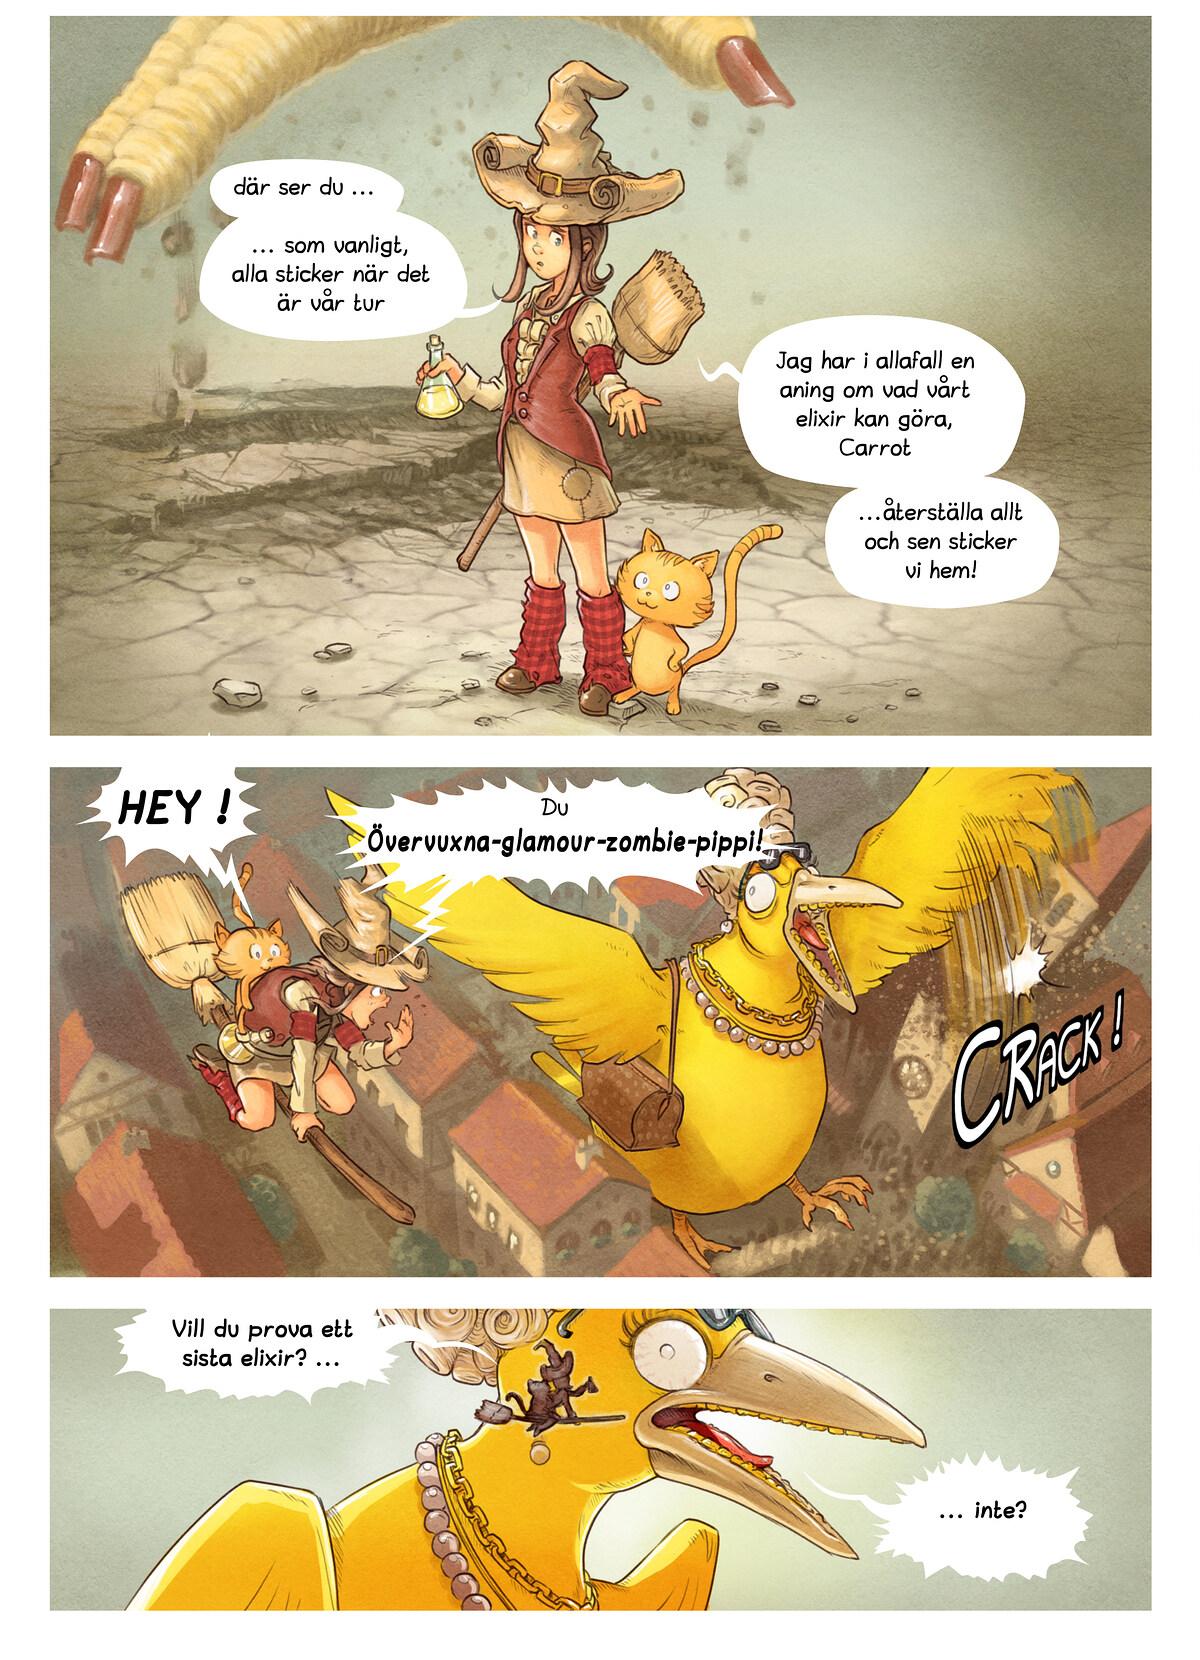 Episode 6: Elixrtävlingen, Page 8